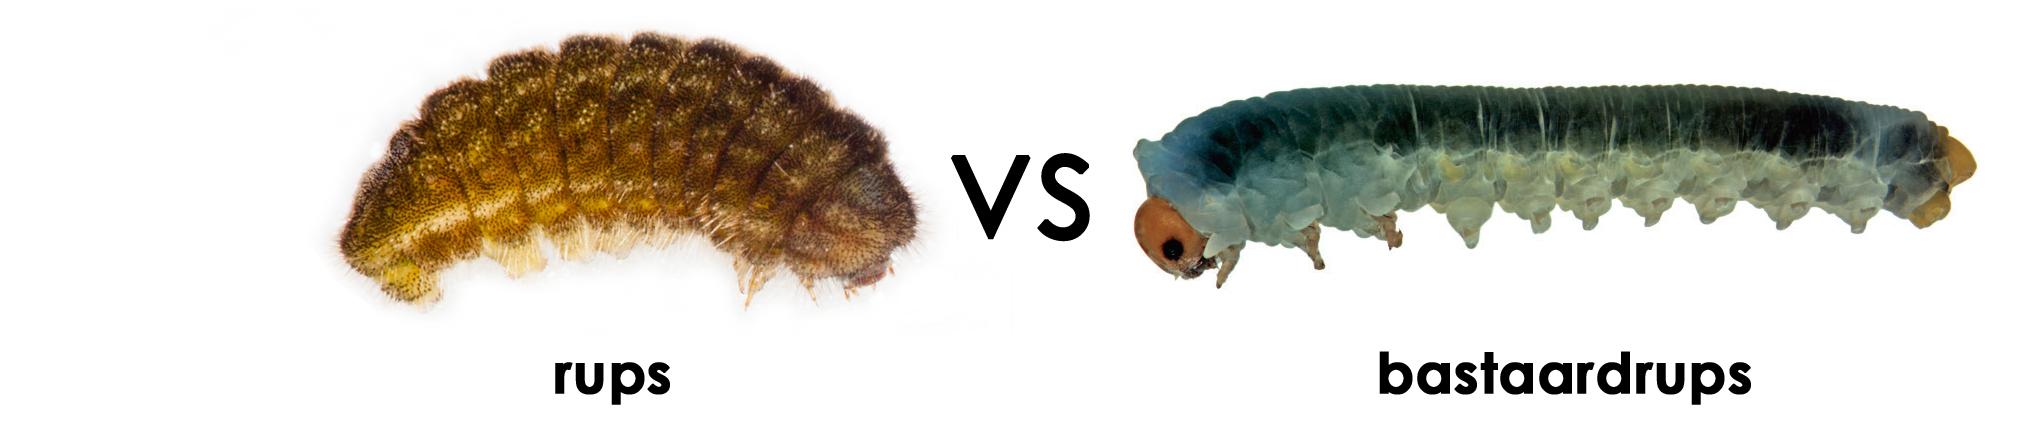 Rups (5e instar) Tijgerblauwtje (Lampides boeticus) vs bastaardrups (Xenapates braunsi)